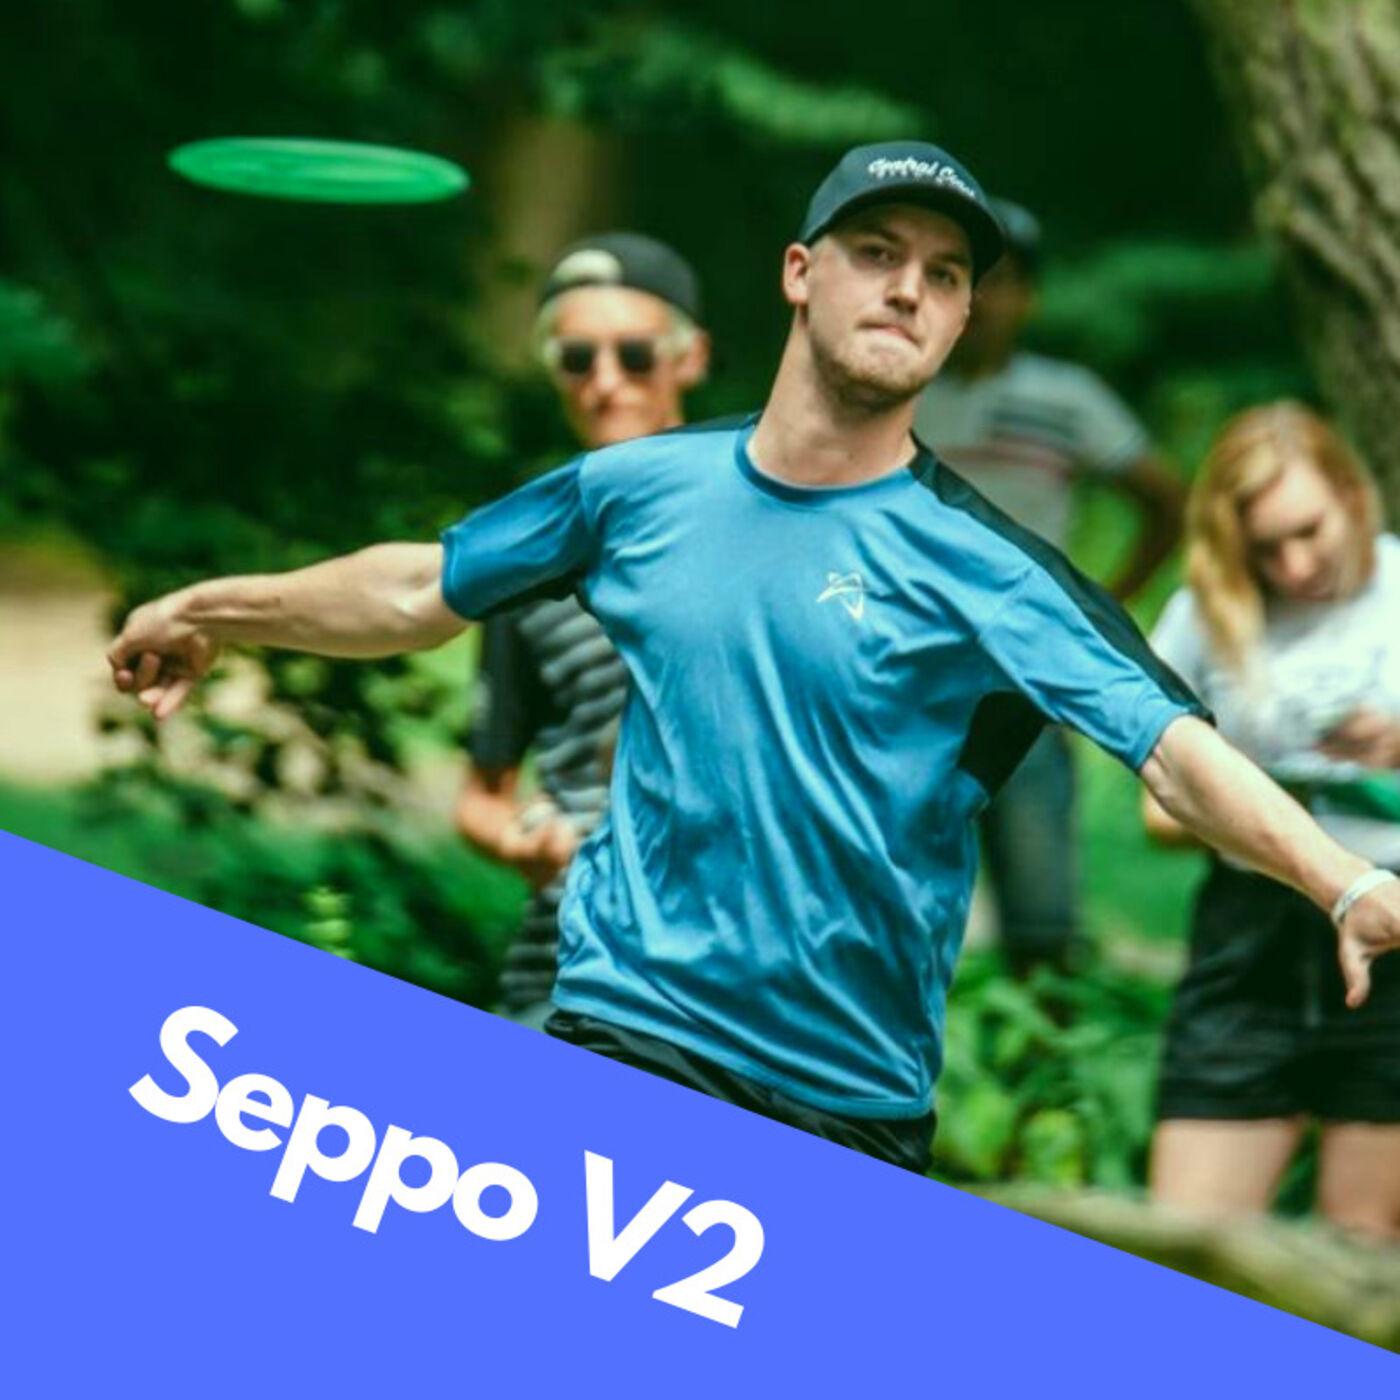 Seppo V2 - a talk with Seppo Paju